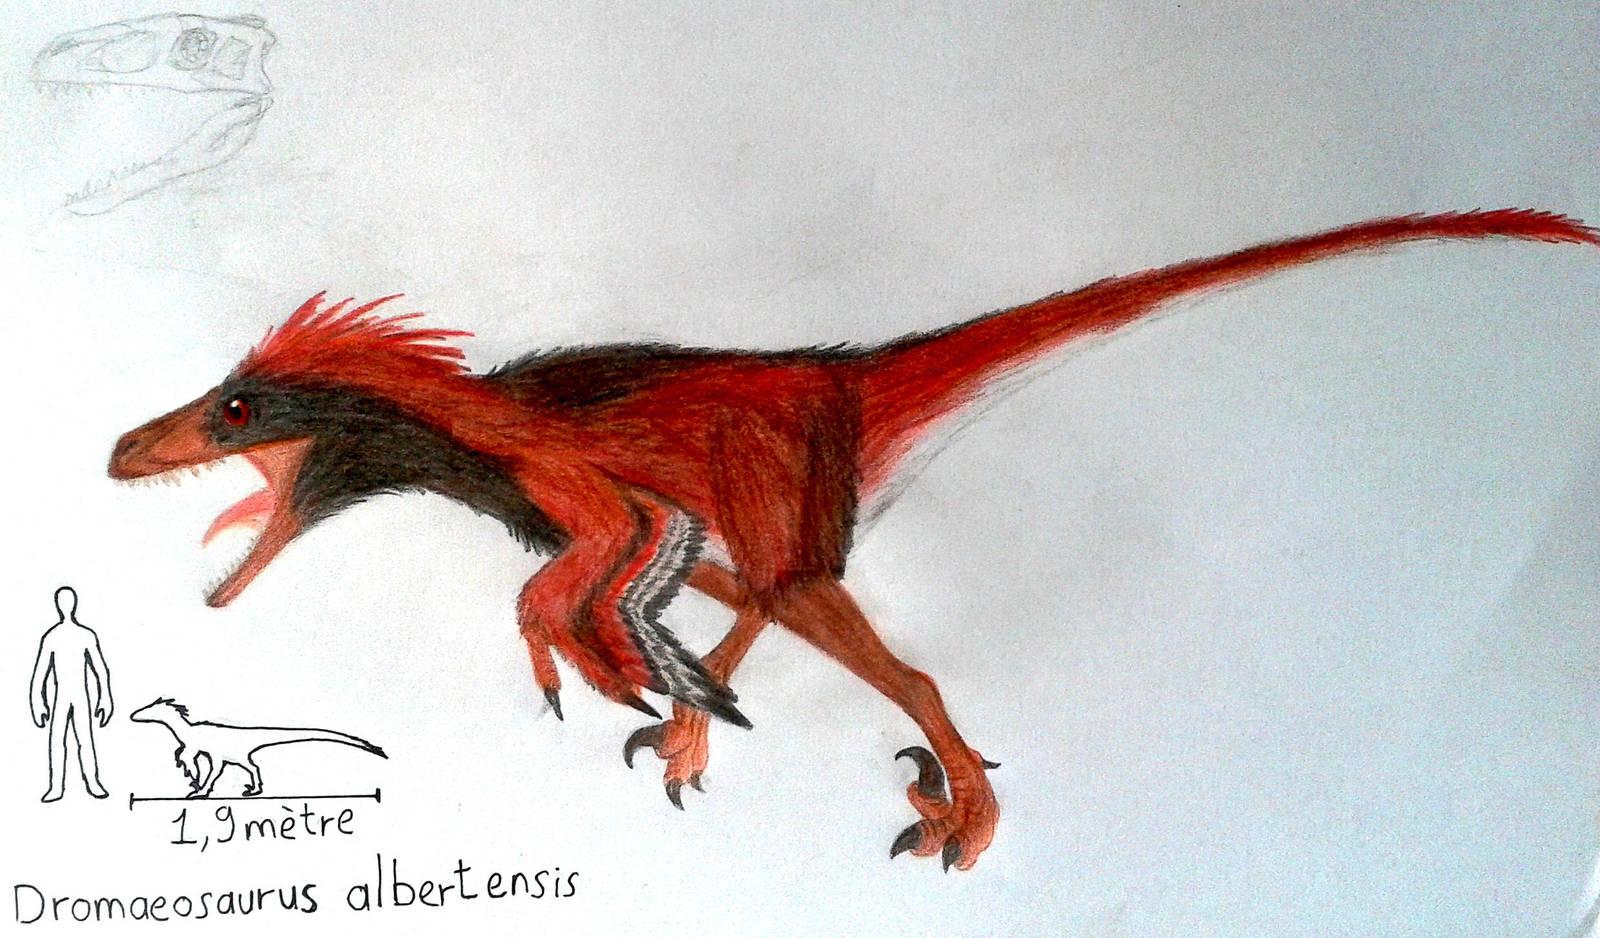 Dromaeosaurus albertensis by ZeWqt